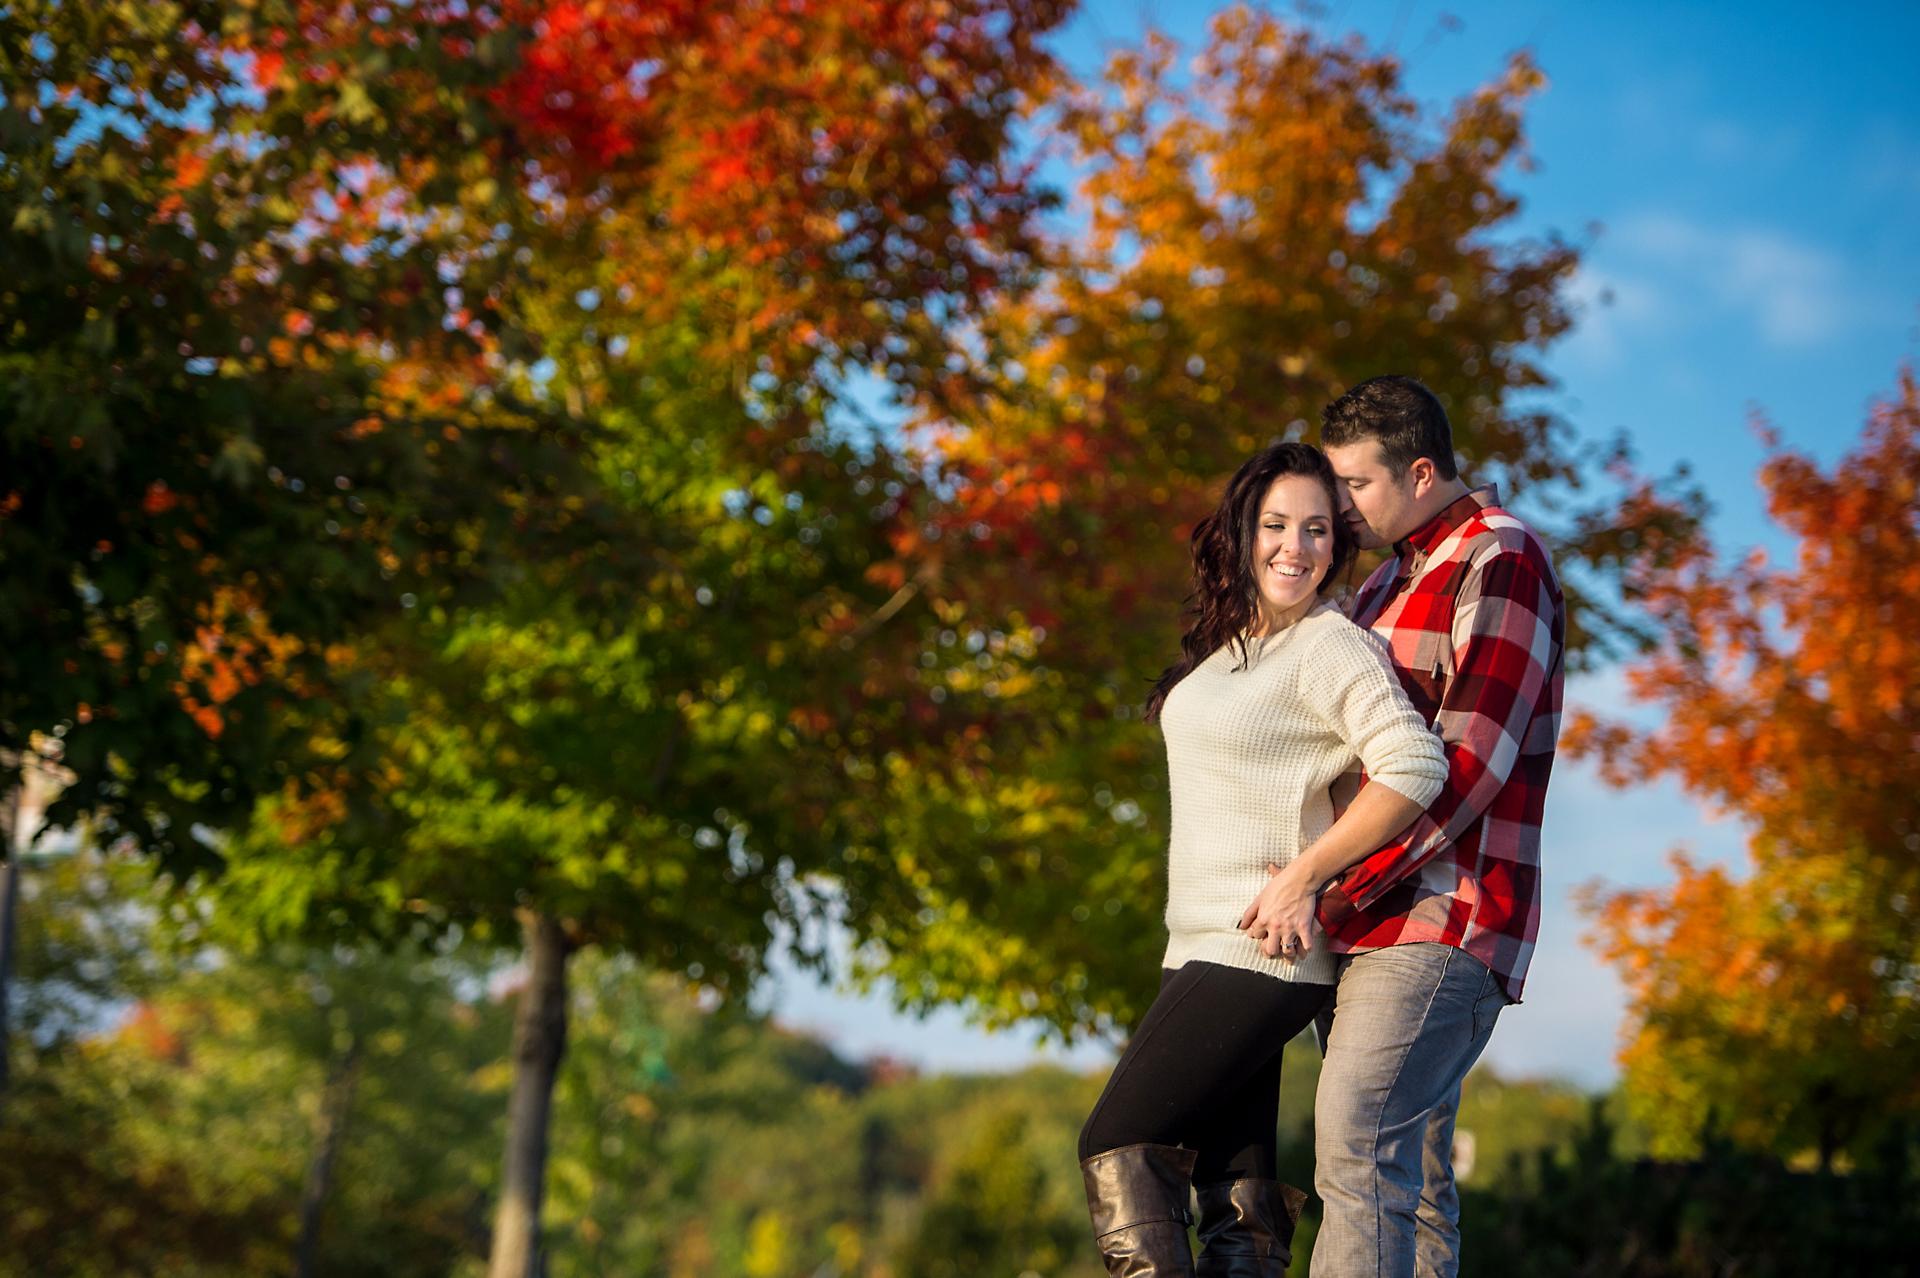 Will & Sarah | High Falls | Muskoka Engagement Photography17